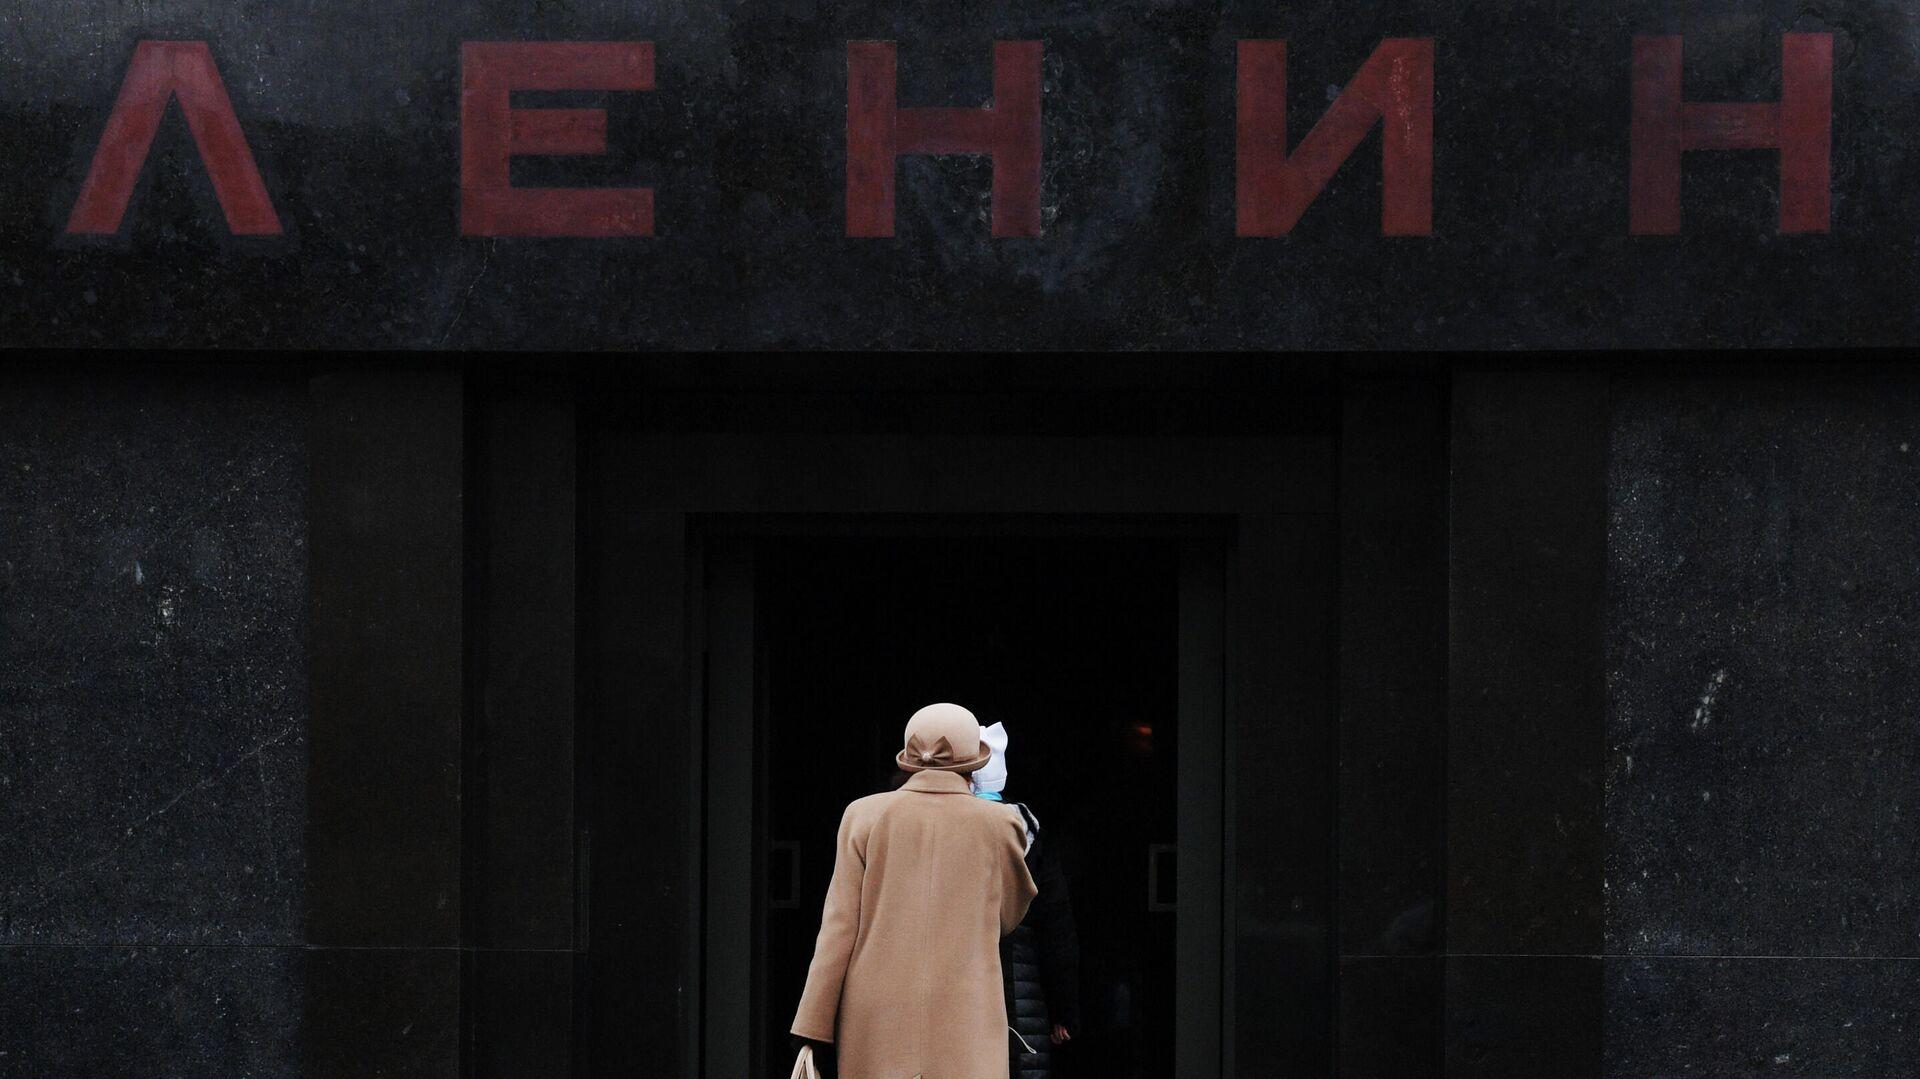 Посетители заходят в Мавзолей В.И. Ленина на Красной площади - РИА Новости, 1920, 01.07.2020